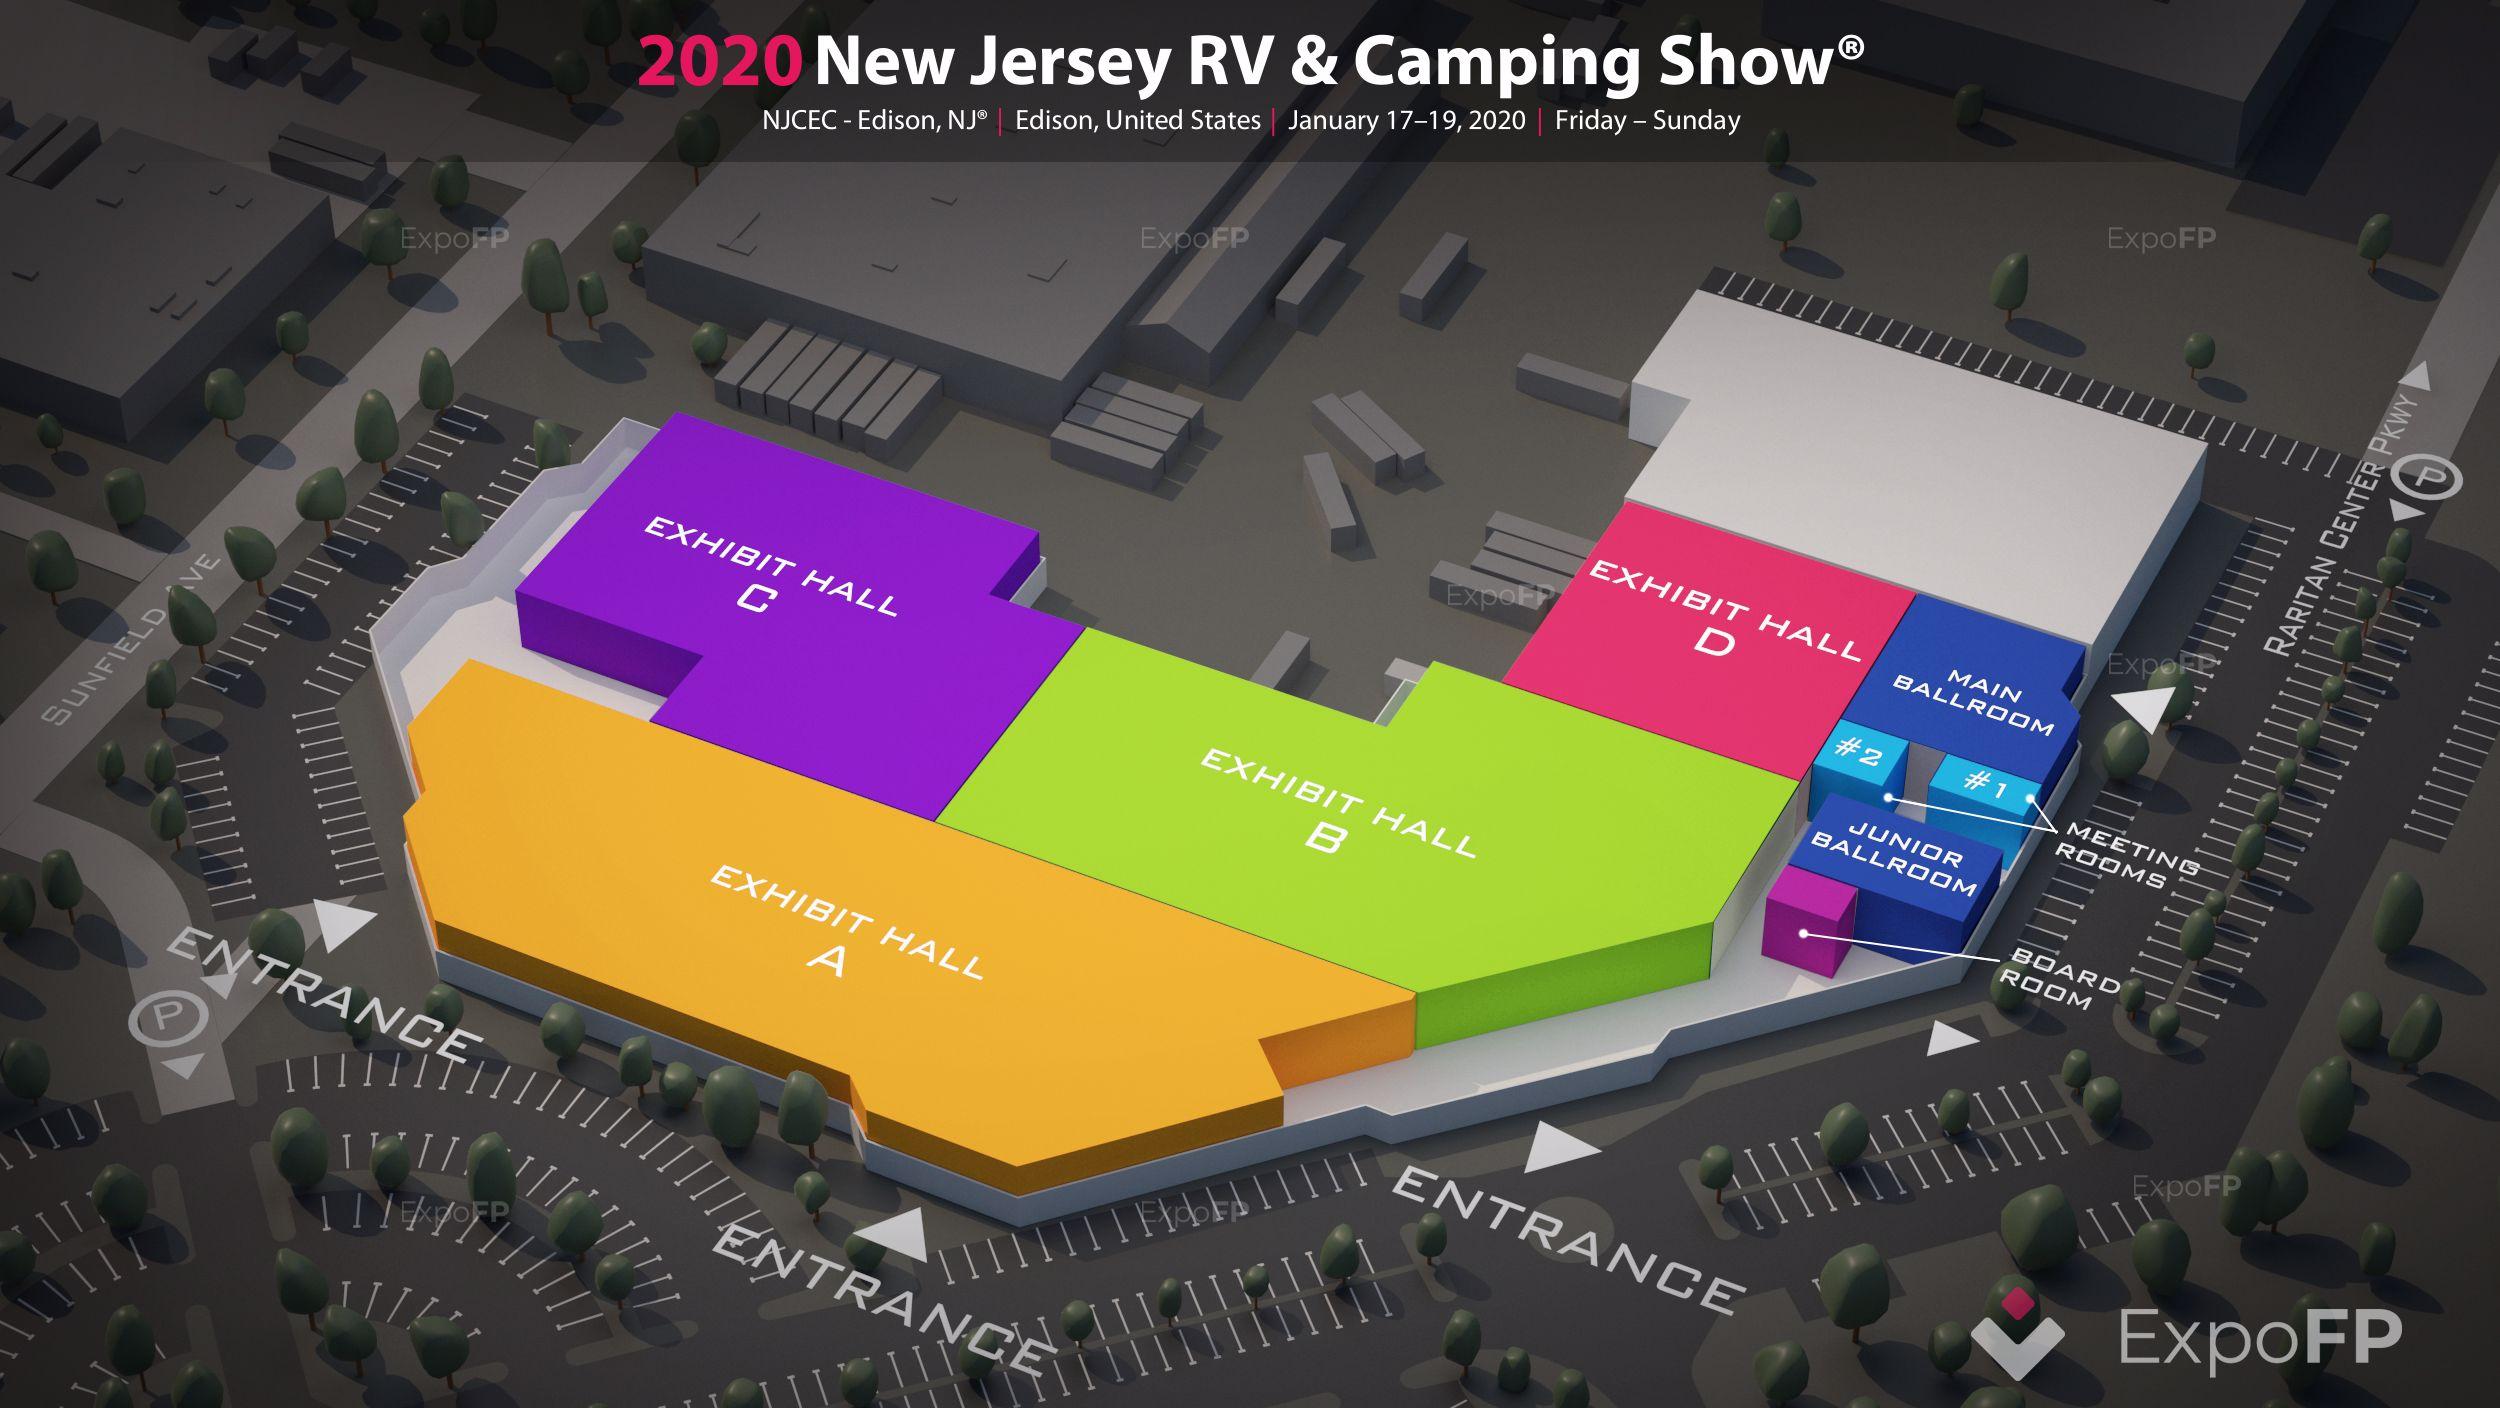 Dallas Rv Show 2020.New Jersey Rv Camping Show 2020 In Njcec